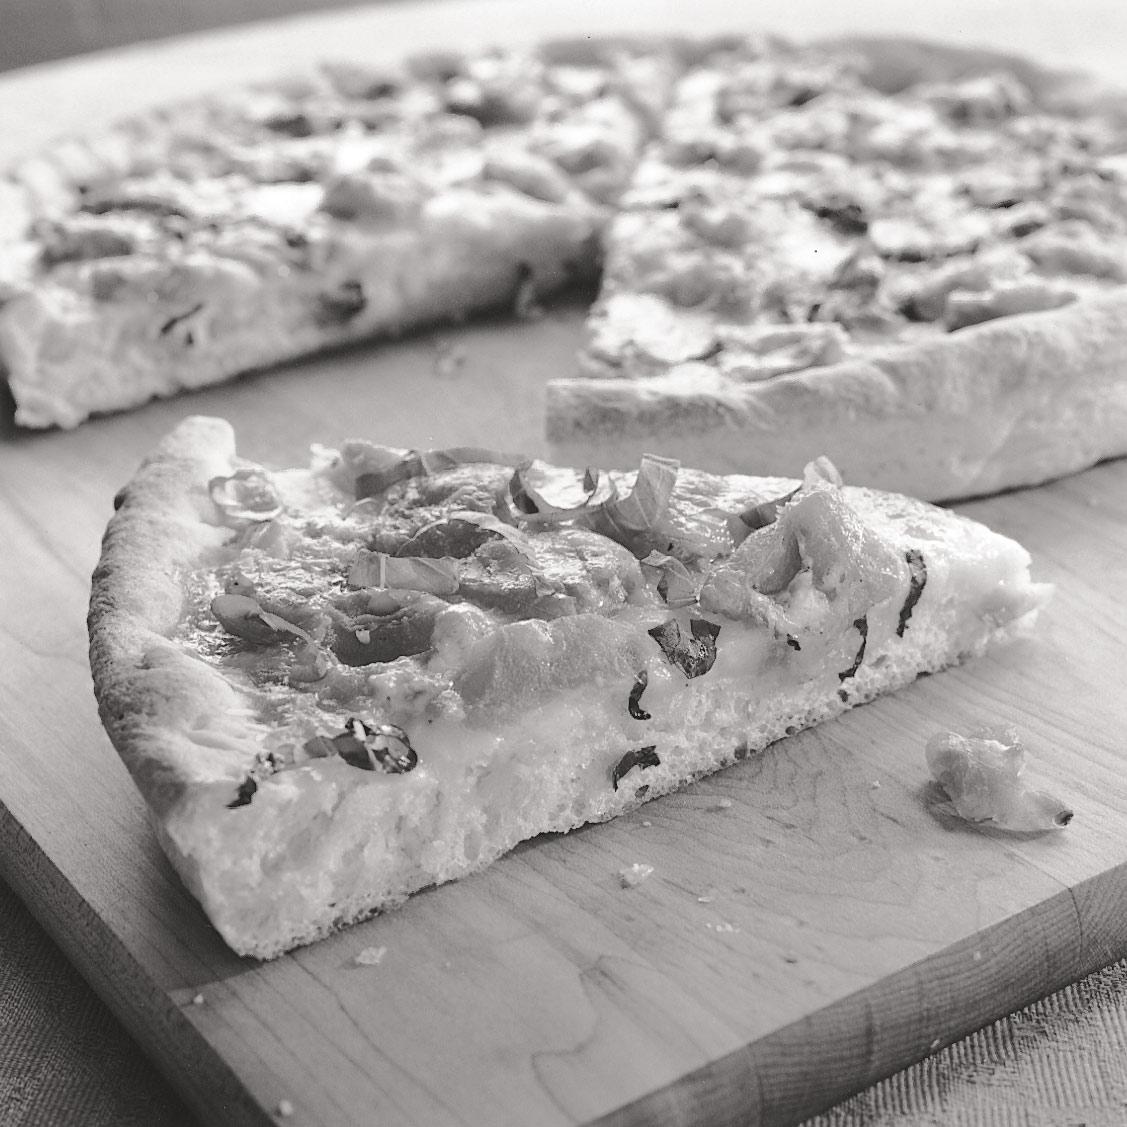 Deep Dish Pizza America S Test Kitchen